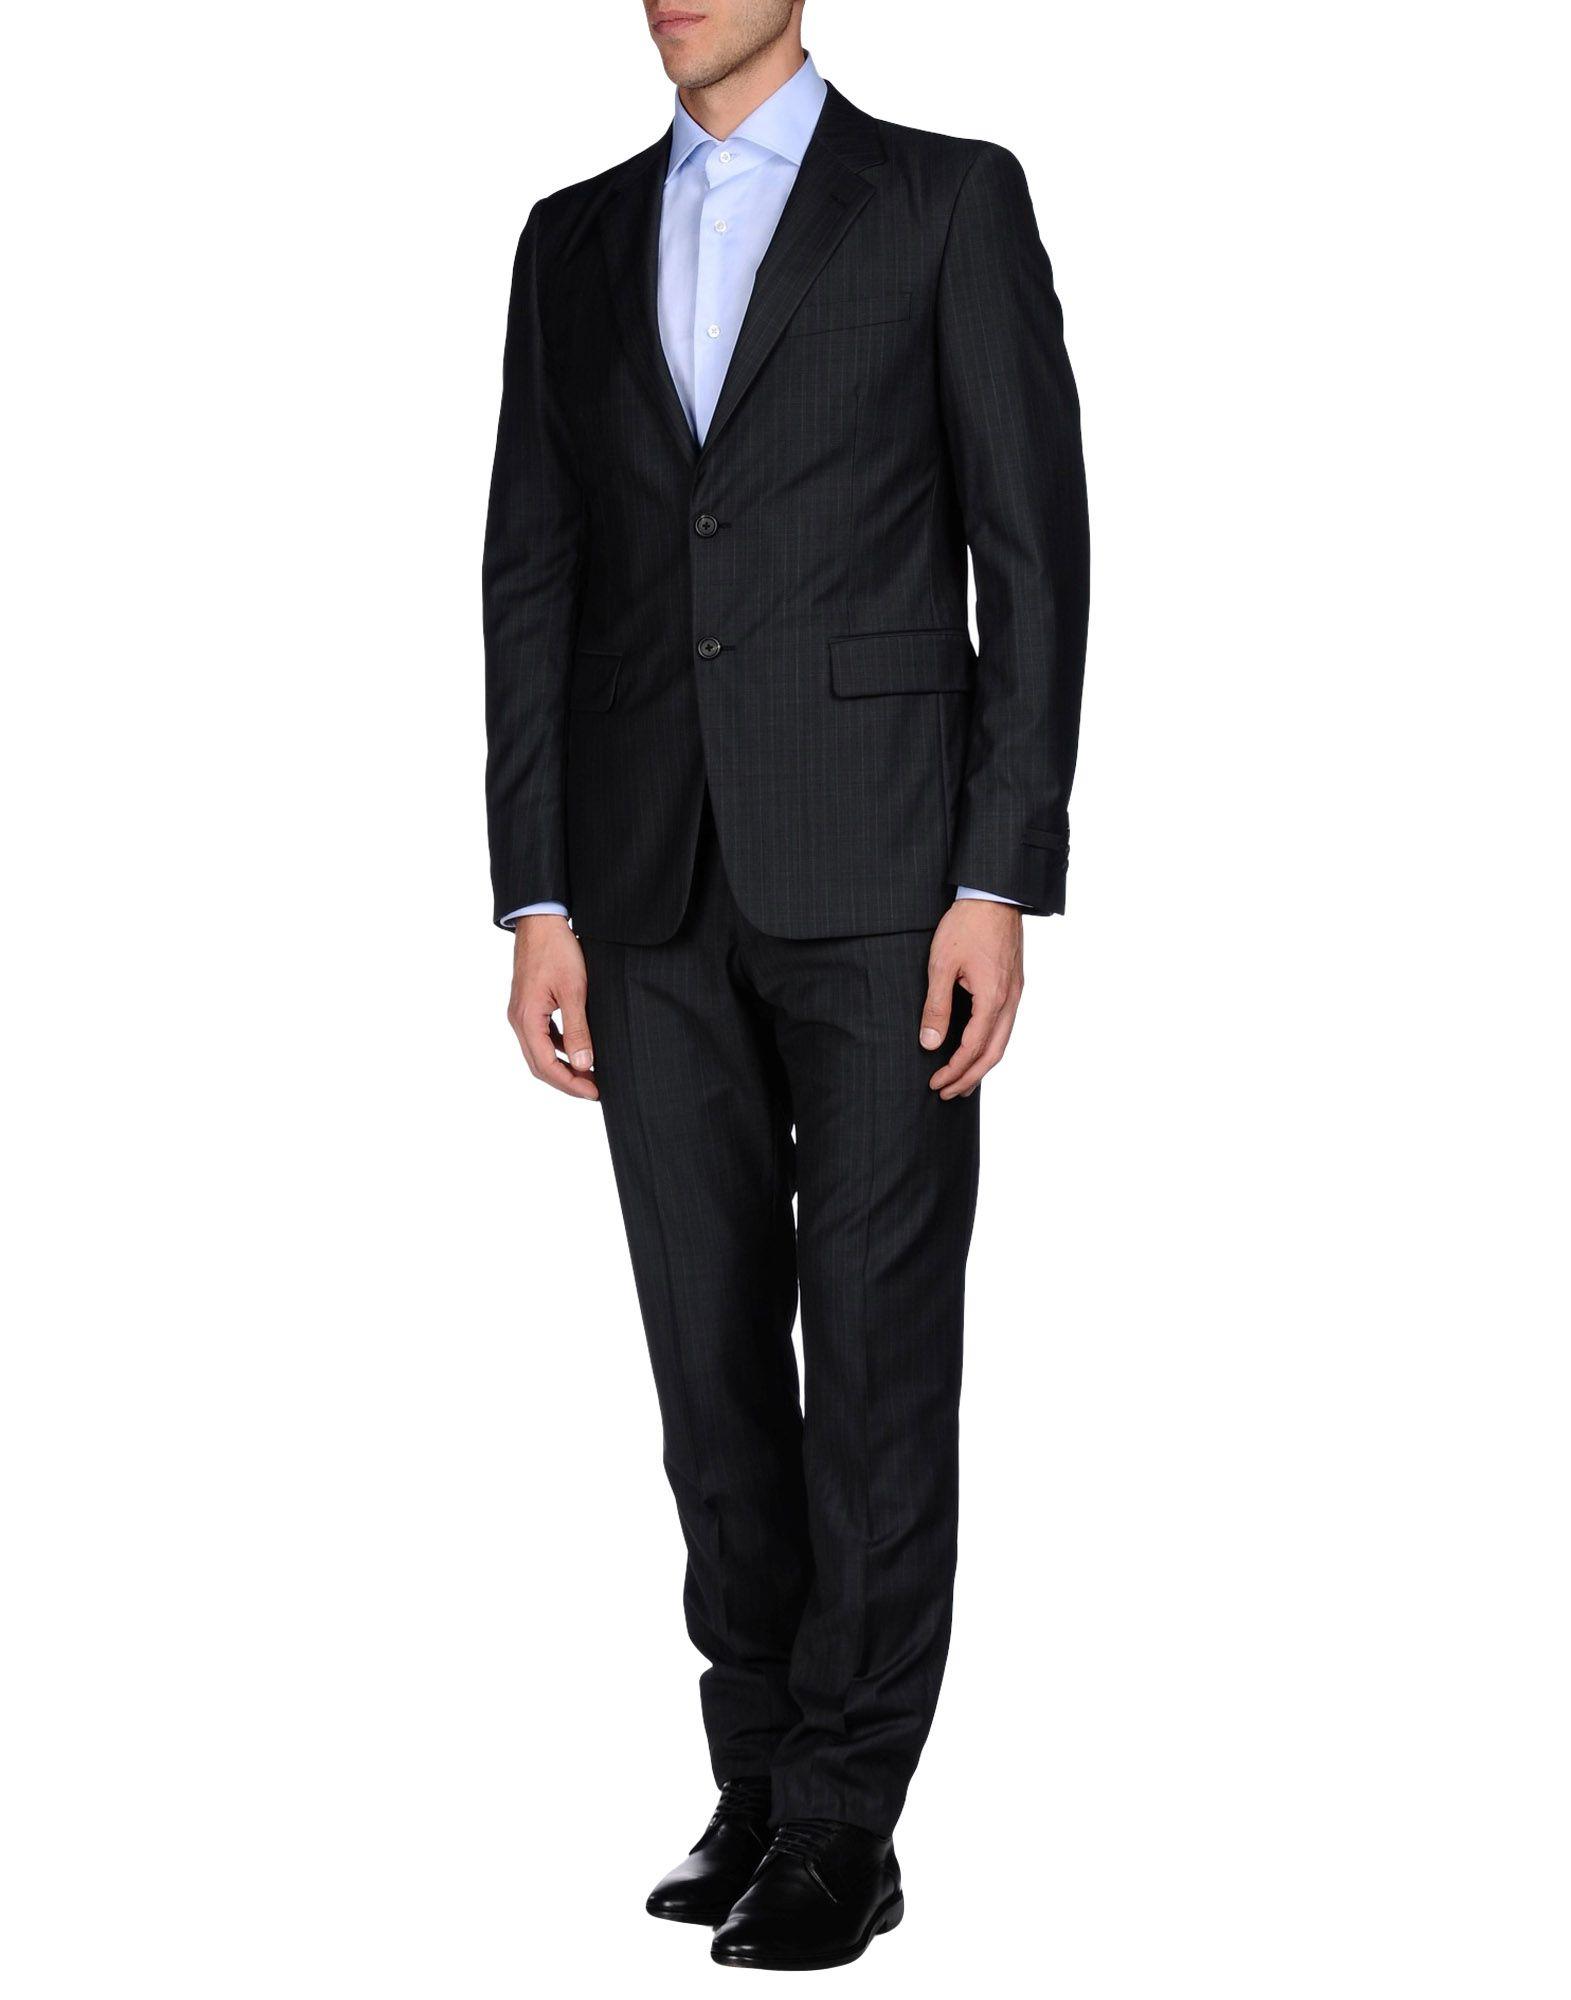 Prada Mens Suits 77